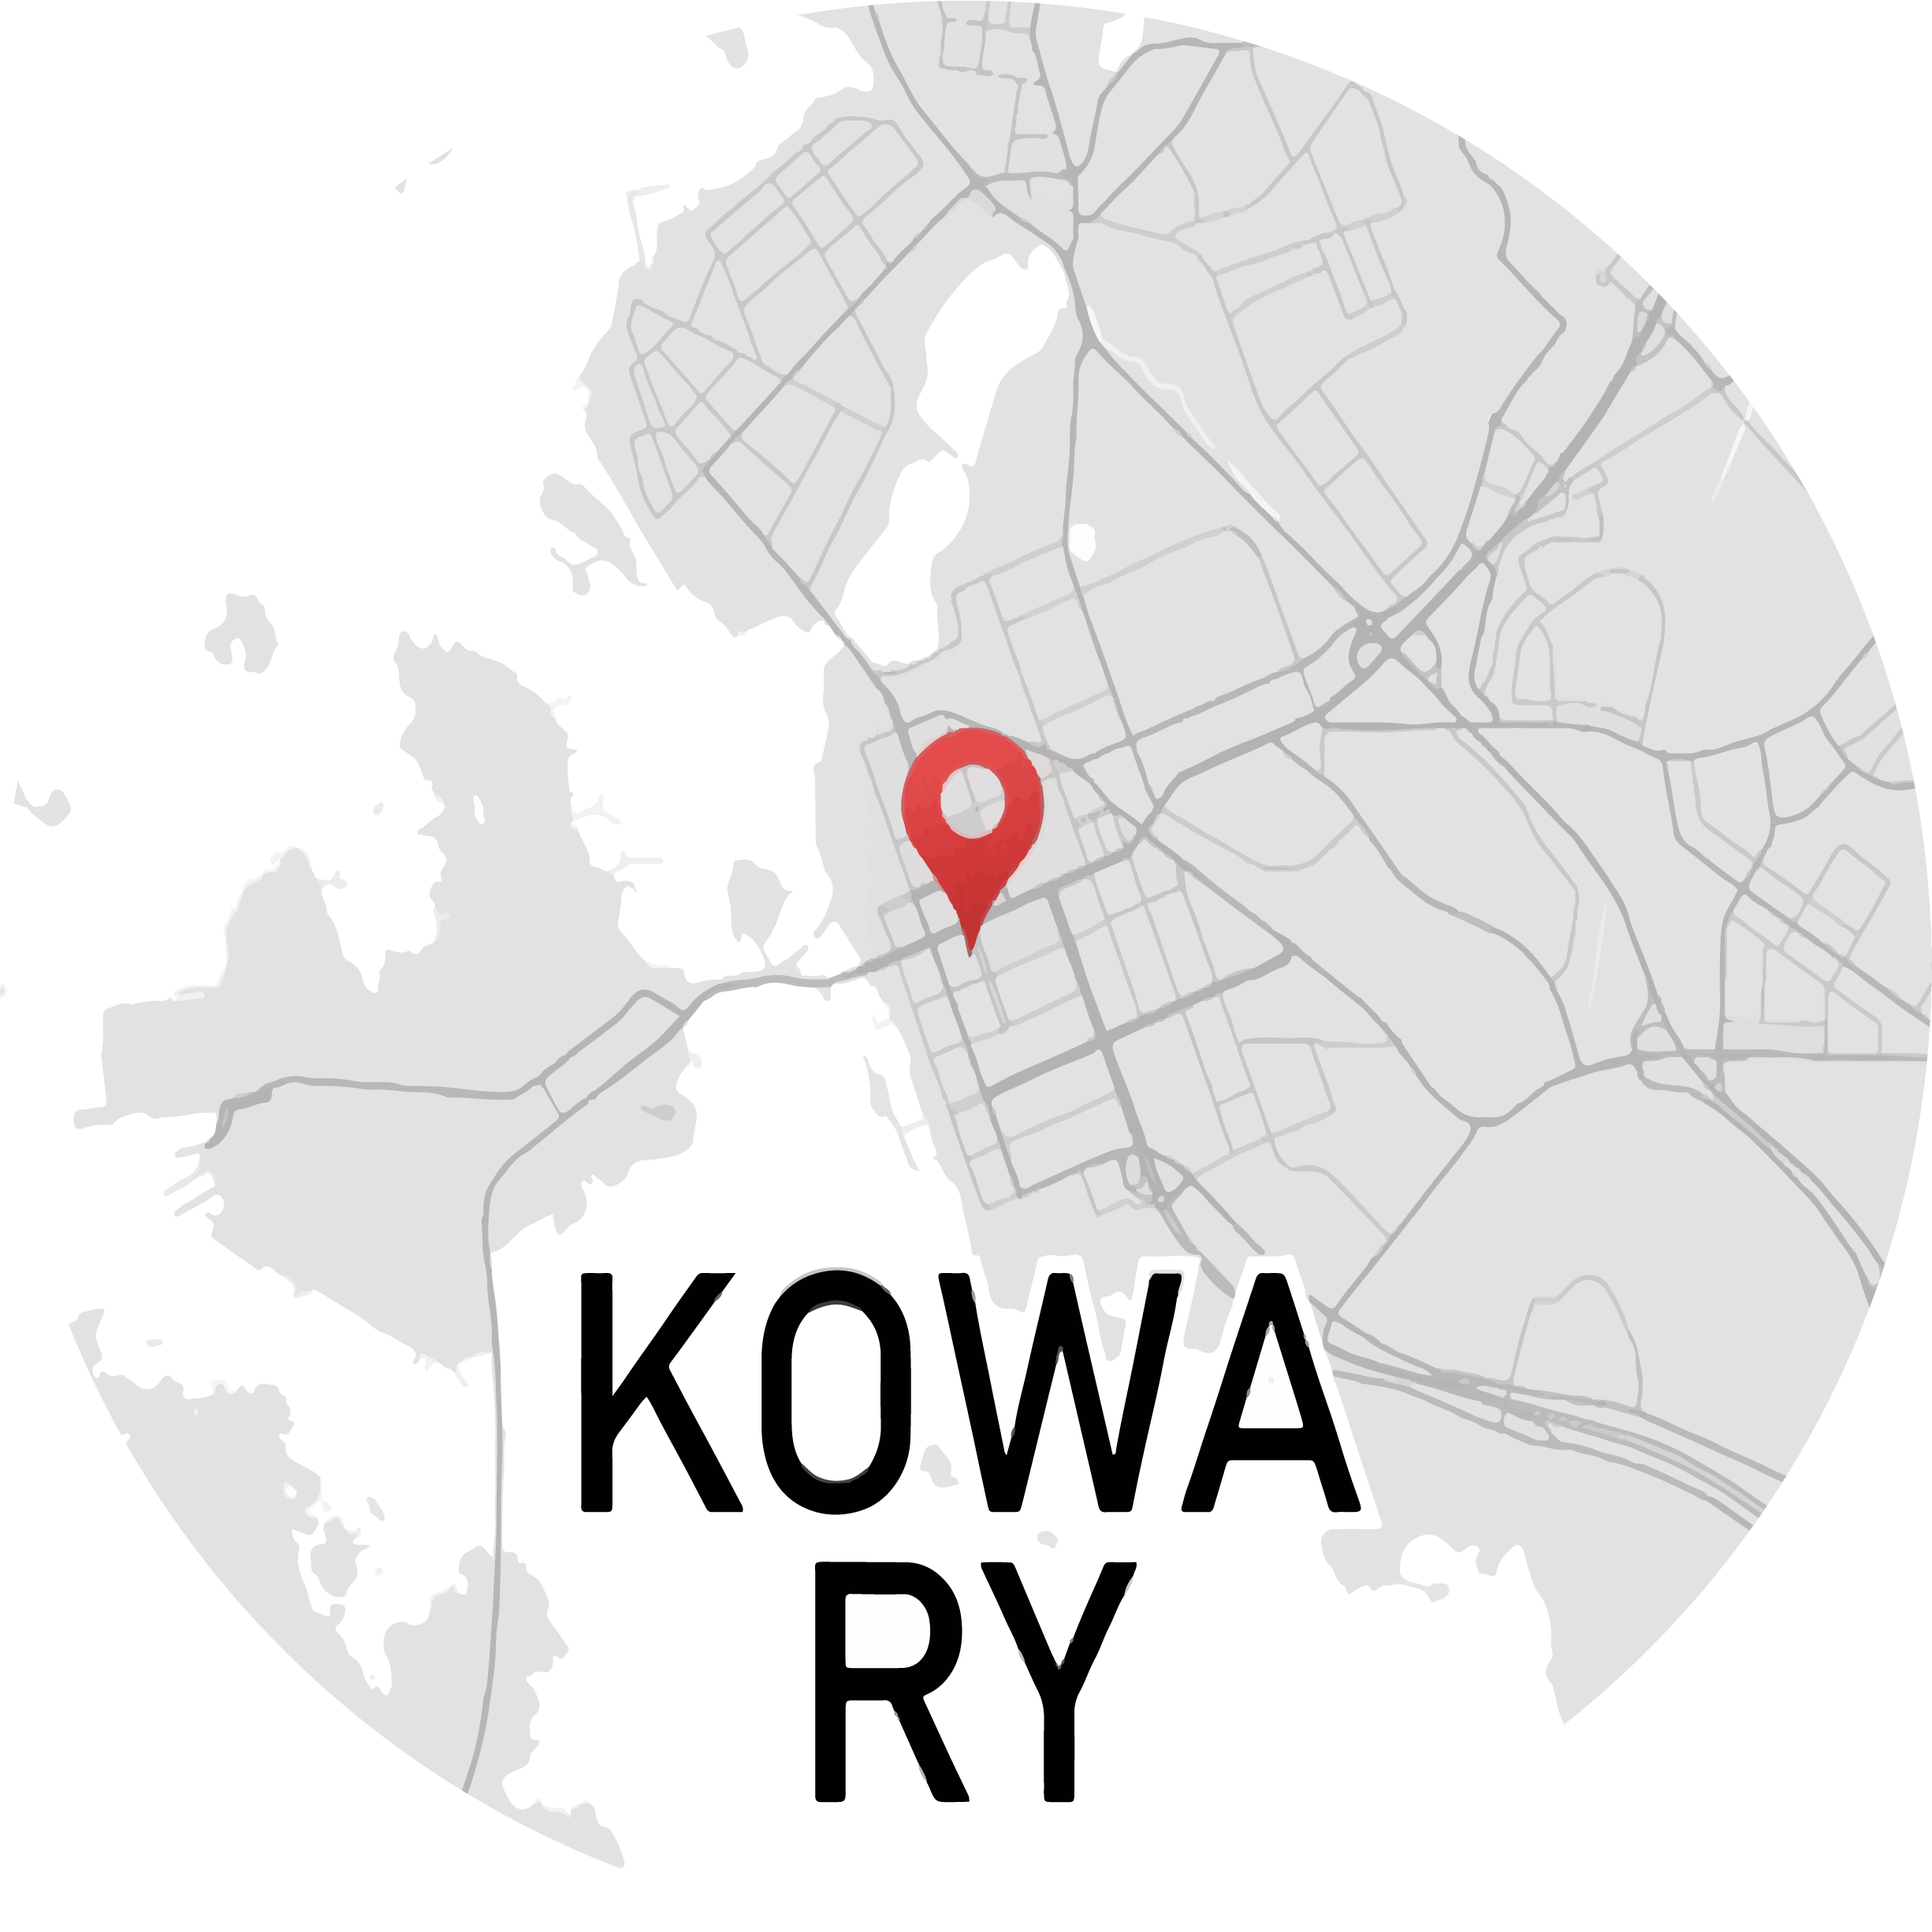 KoWa ry's logo